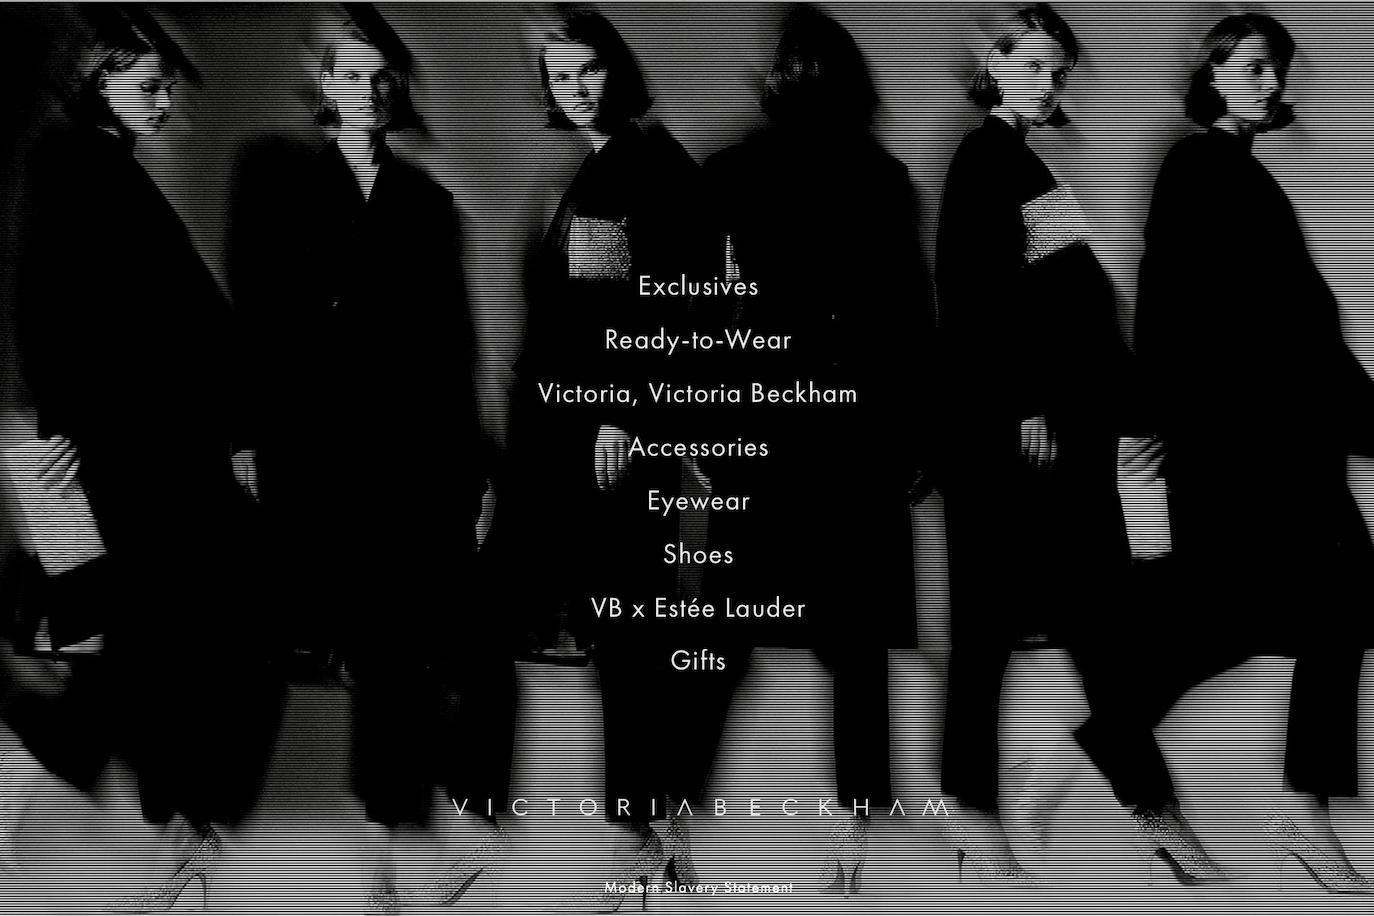 Victoria Beckham 品牌获英国私募基金 Neo 3000万英镑少数股权投资,投后估值或达1亿英镑